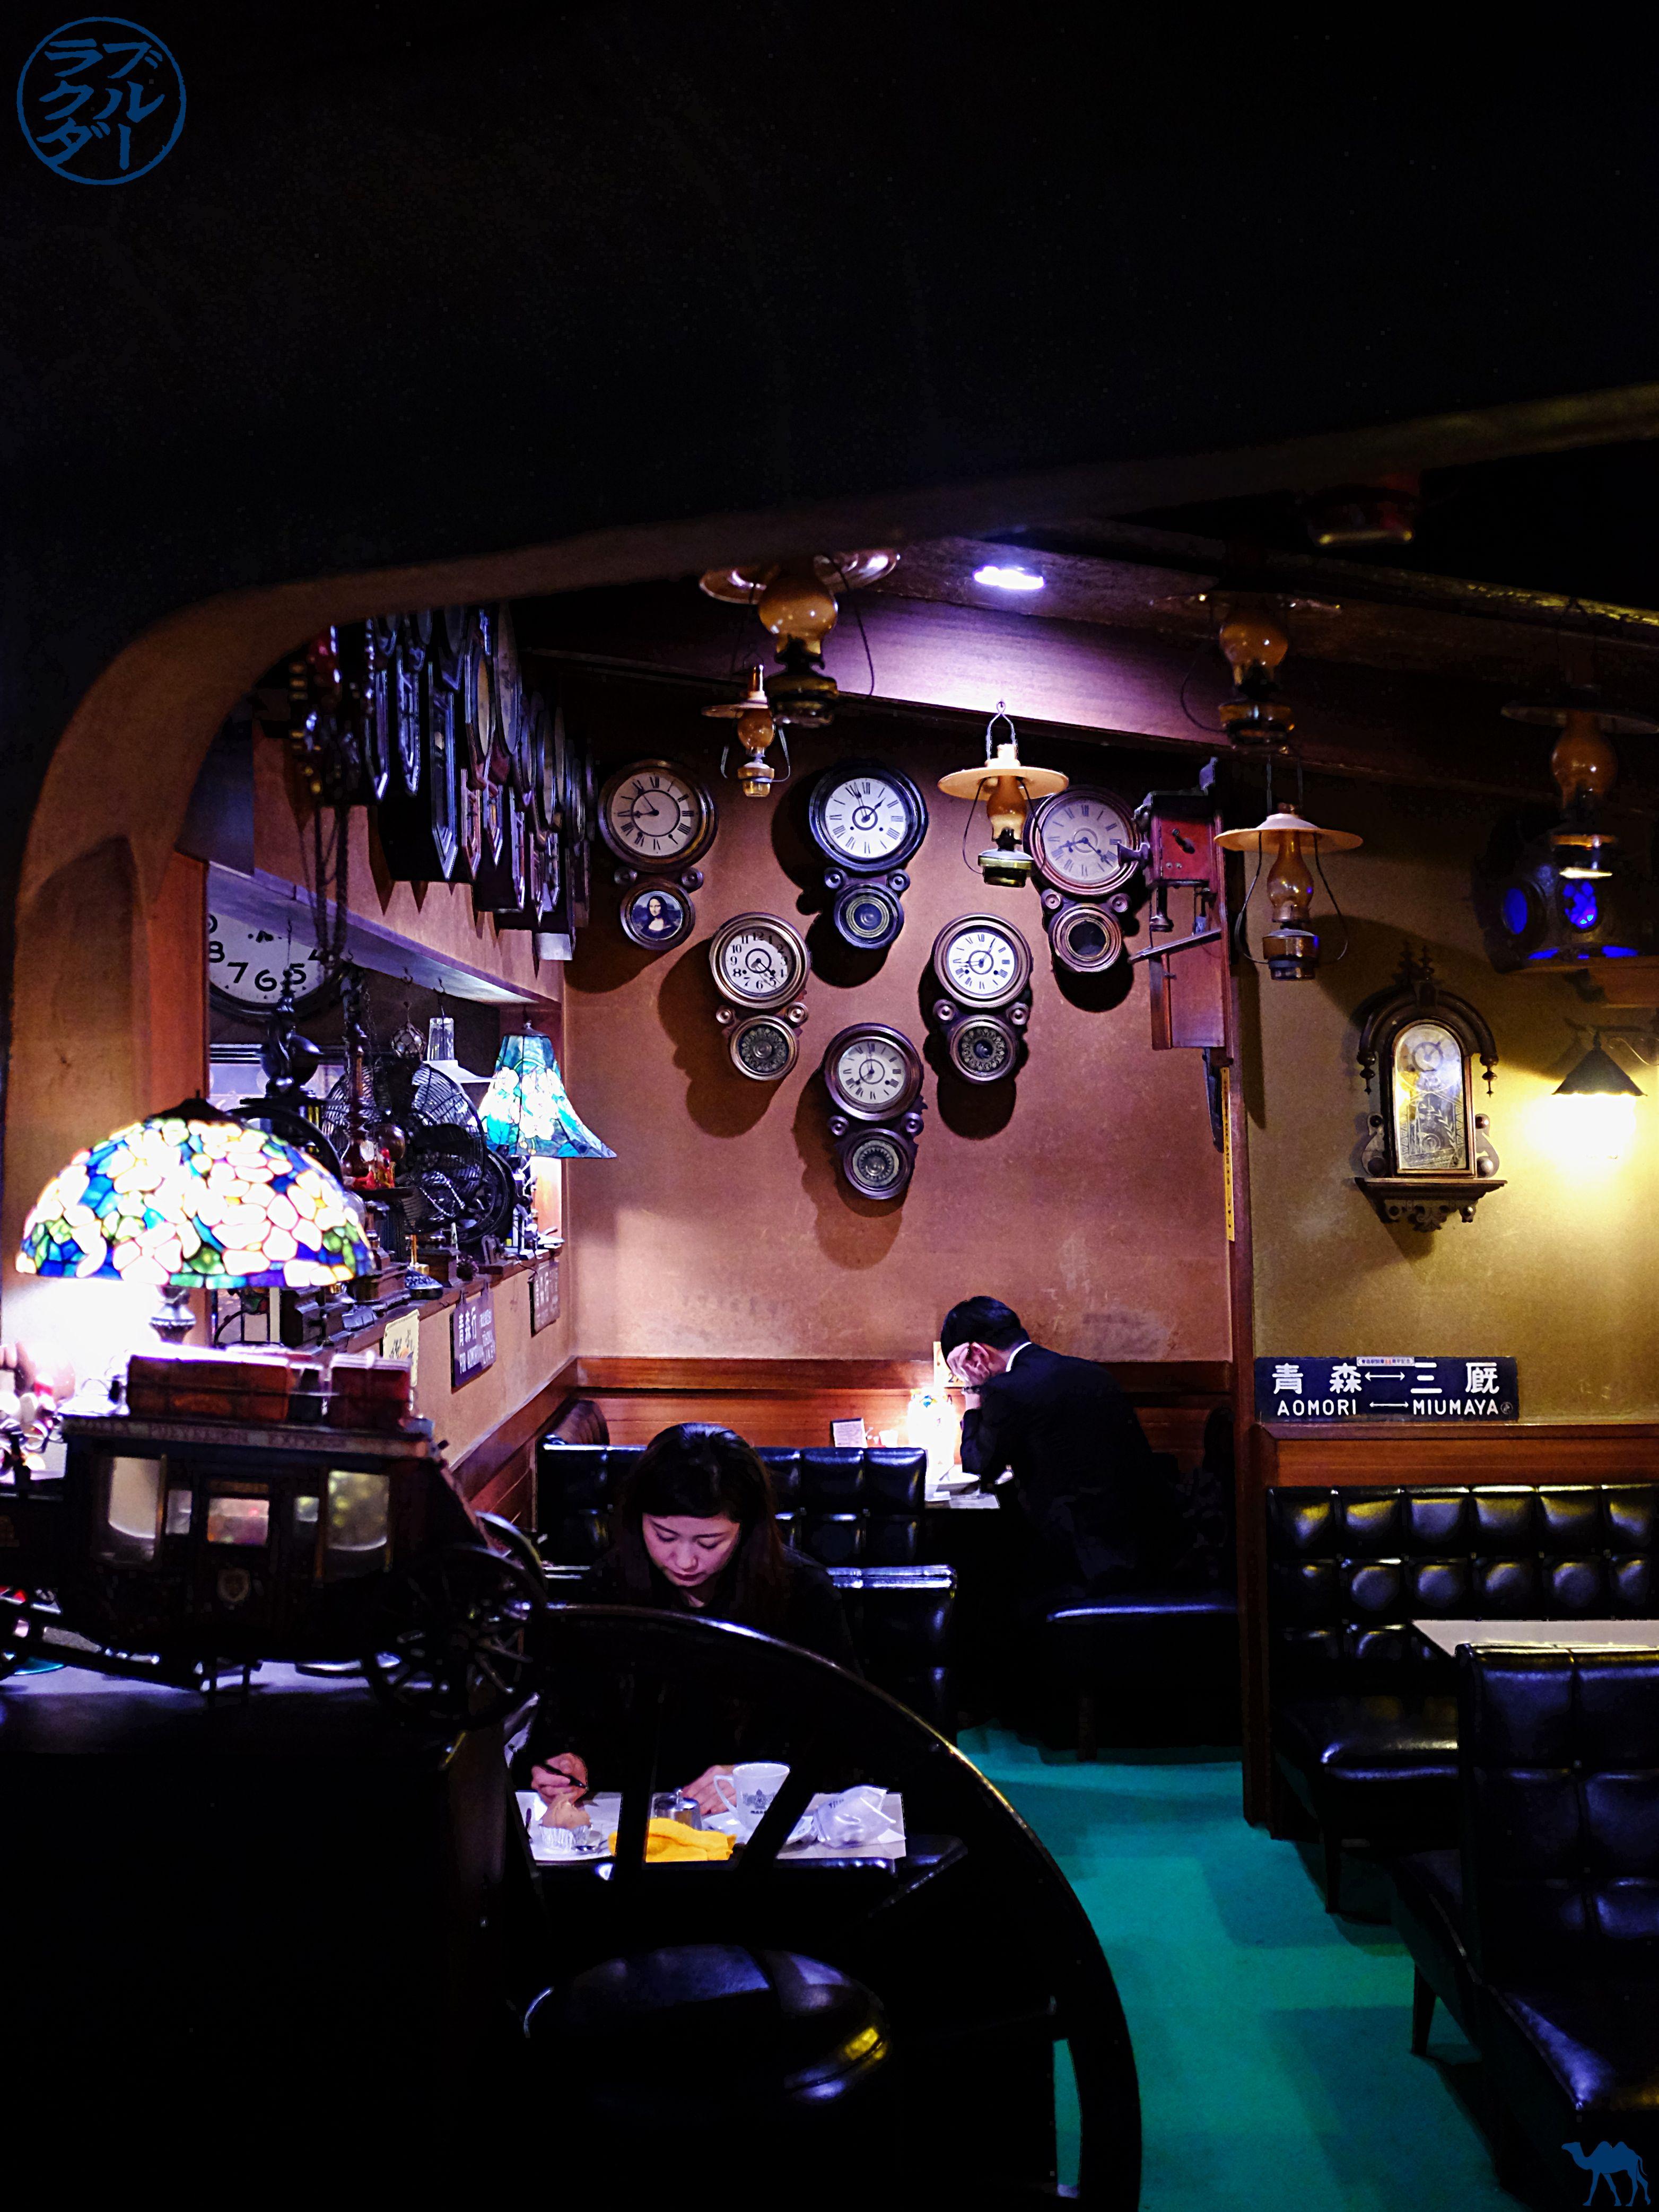 Le Chameau Bleu - Blog Voyage Japon - Coffee Pol - Adresse a Aomori Tohoku Japon